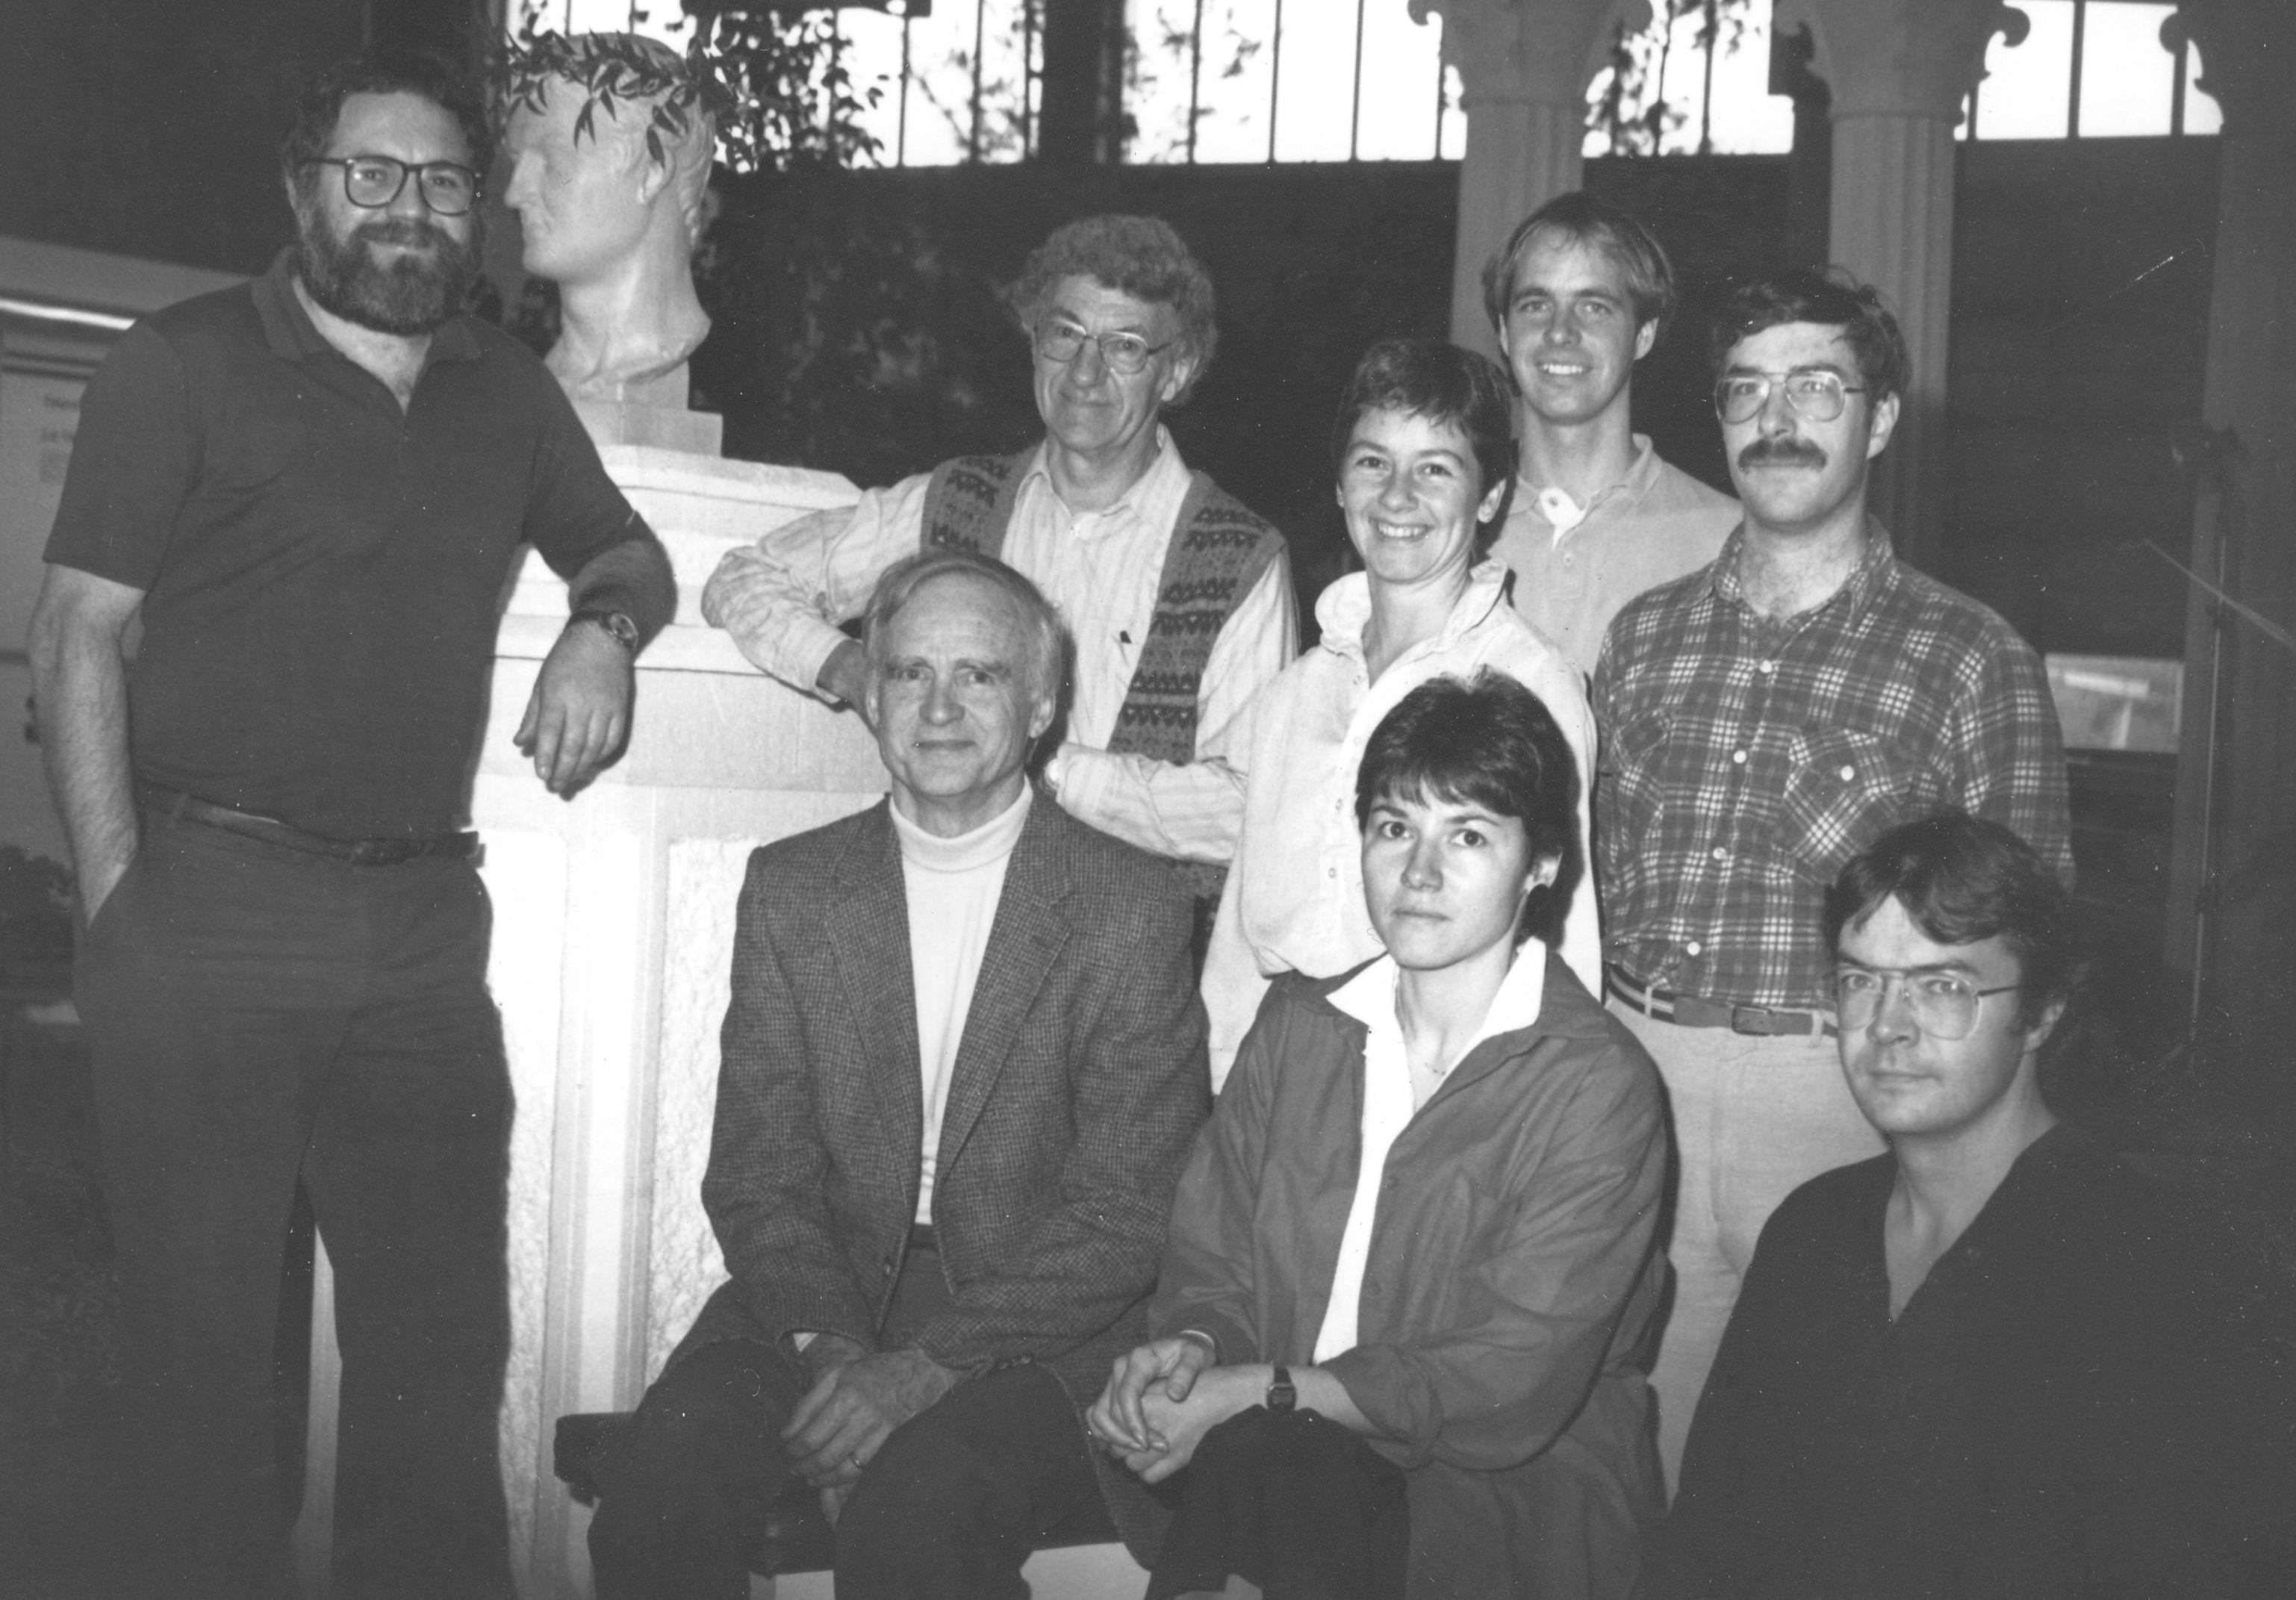 1987-Horticulture-Daniel A Seguin-Monique Page-Mario Cliche-Jean-Claude Vigor-Guy Jains-Lucie Car